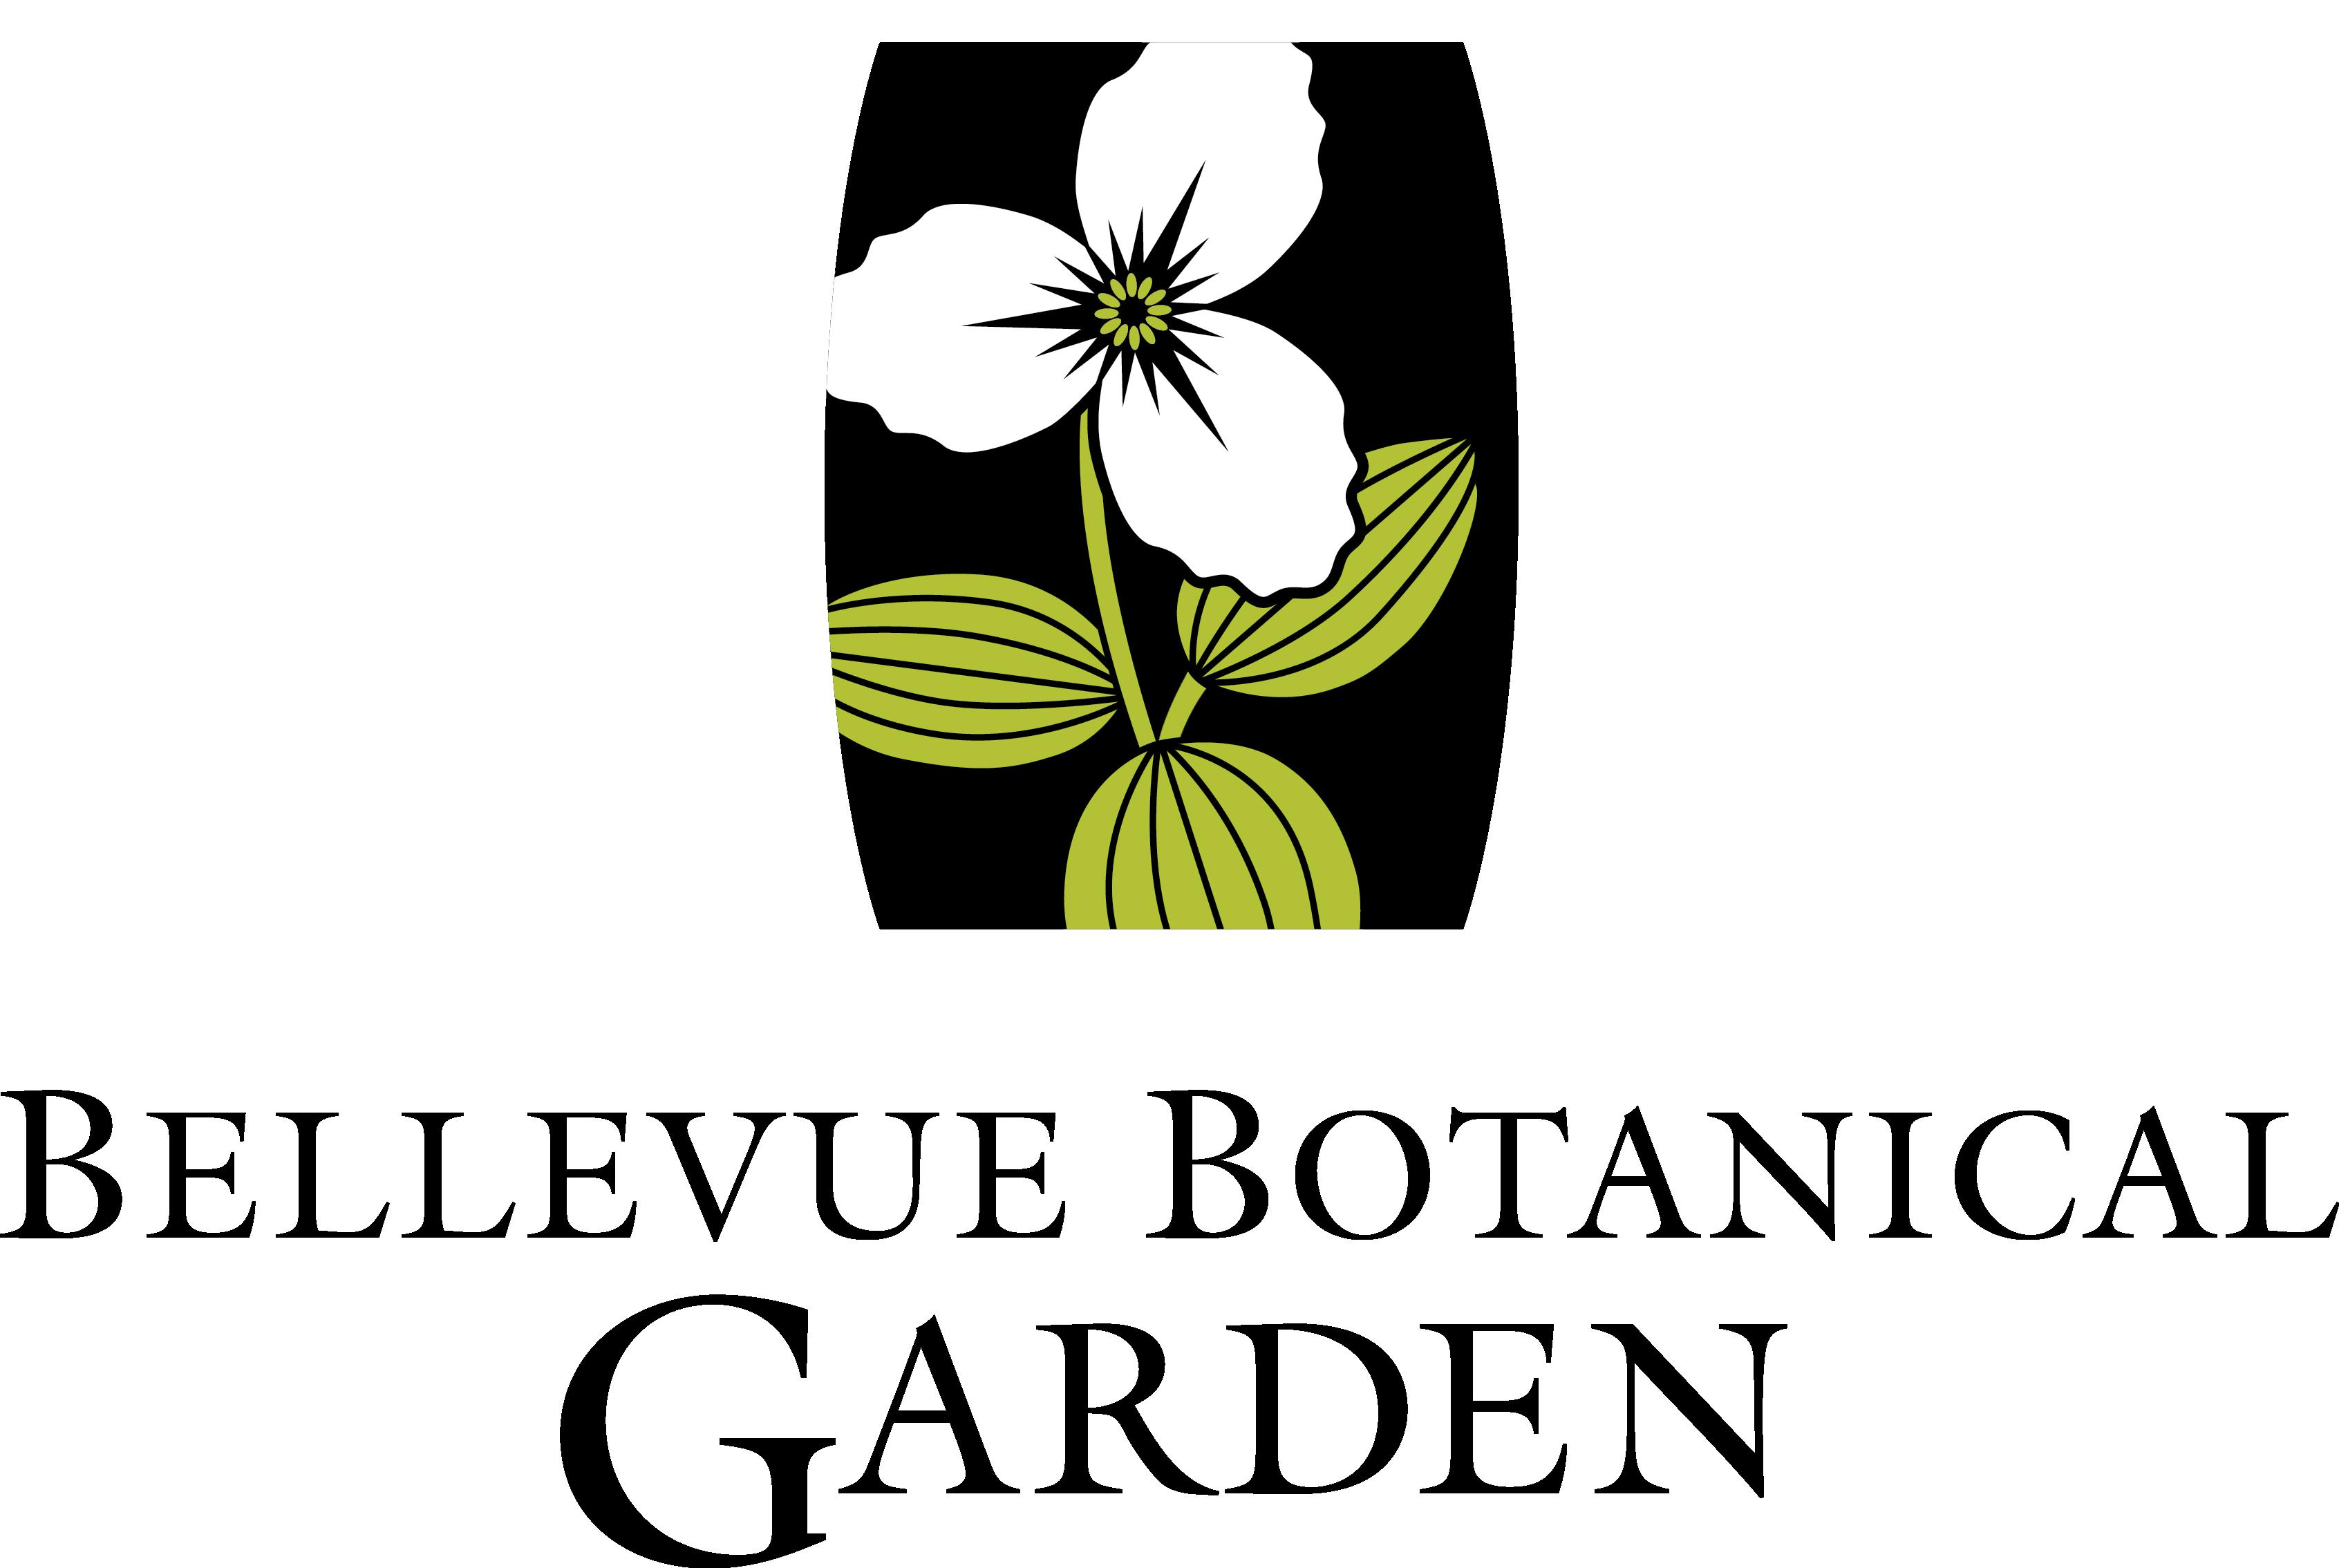 Bellevue Botanical Garden logo